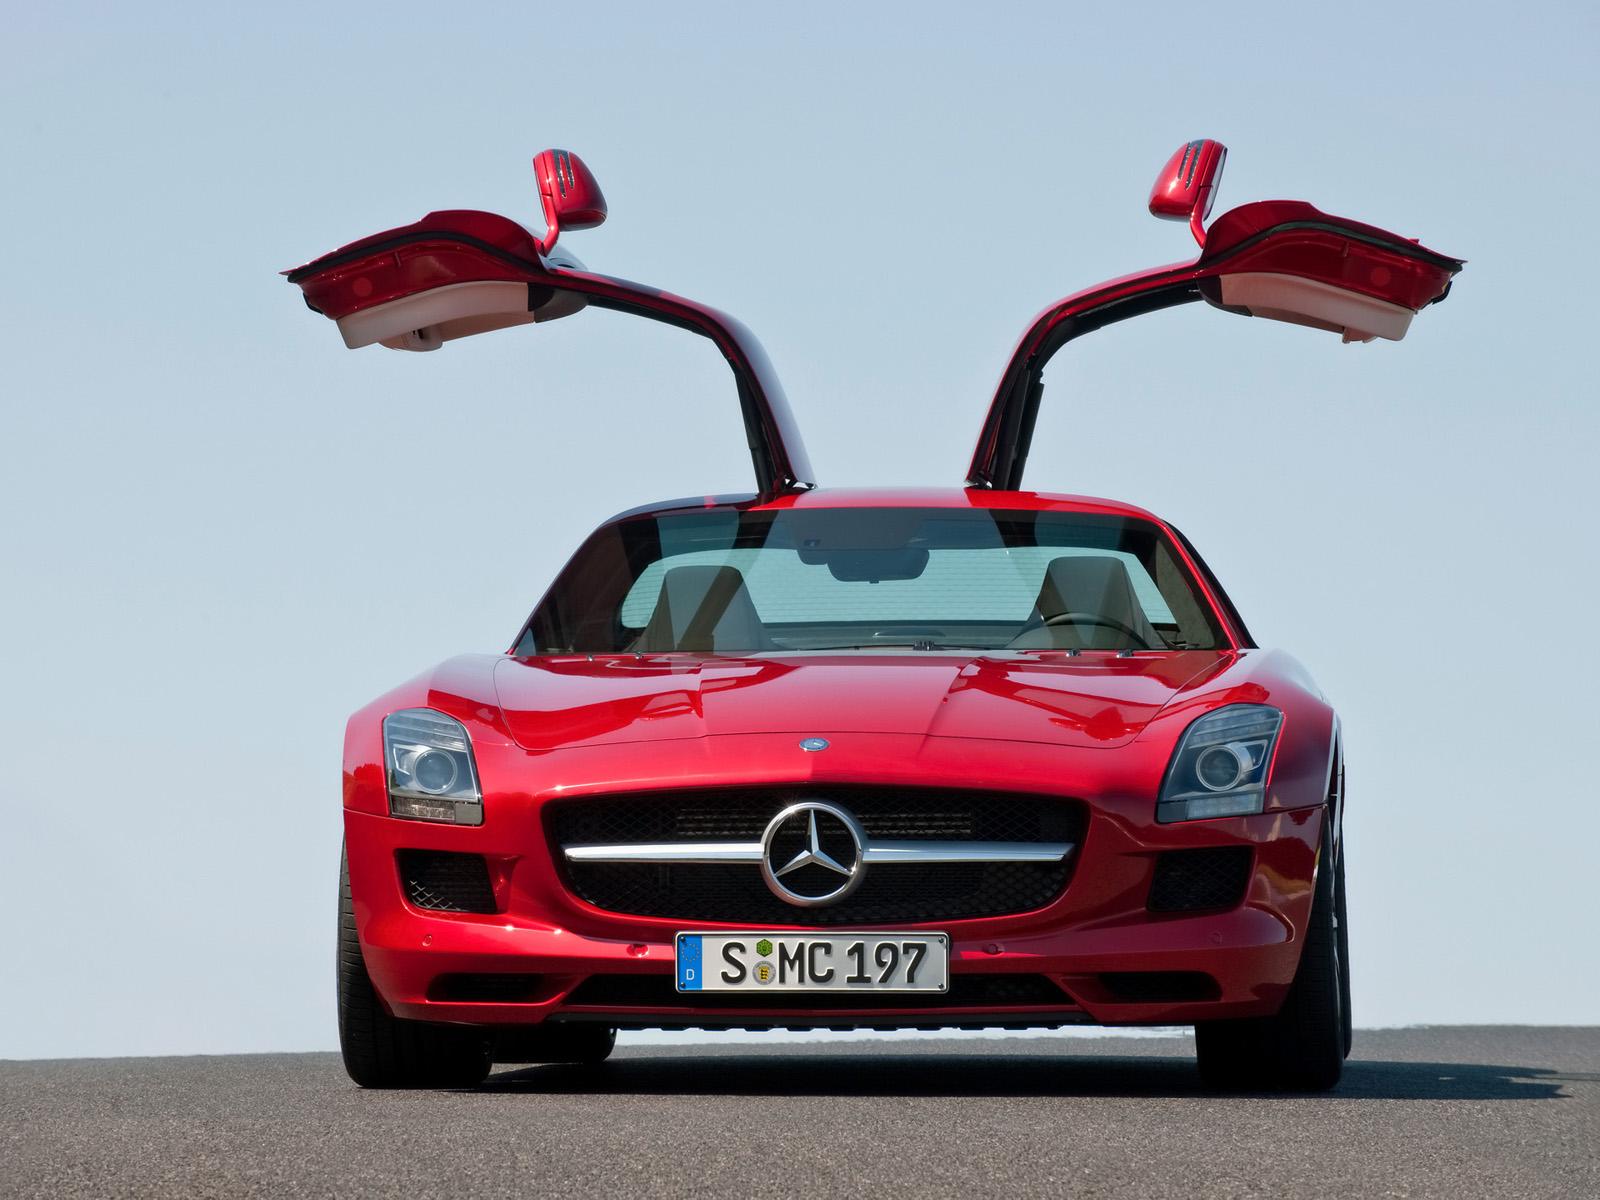 Poze Frumoase Mercedes Poze Frumoase Pentru Desktop